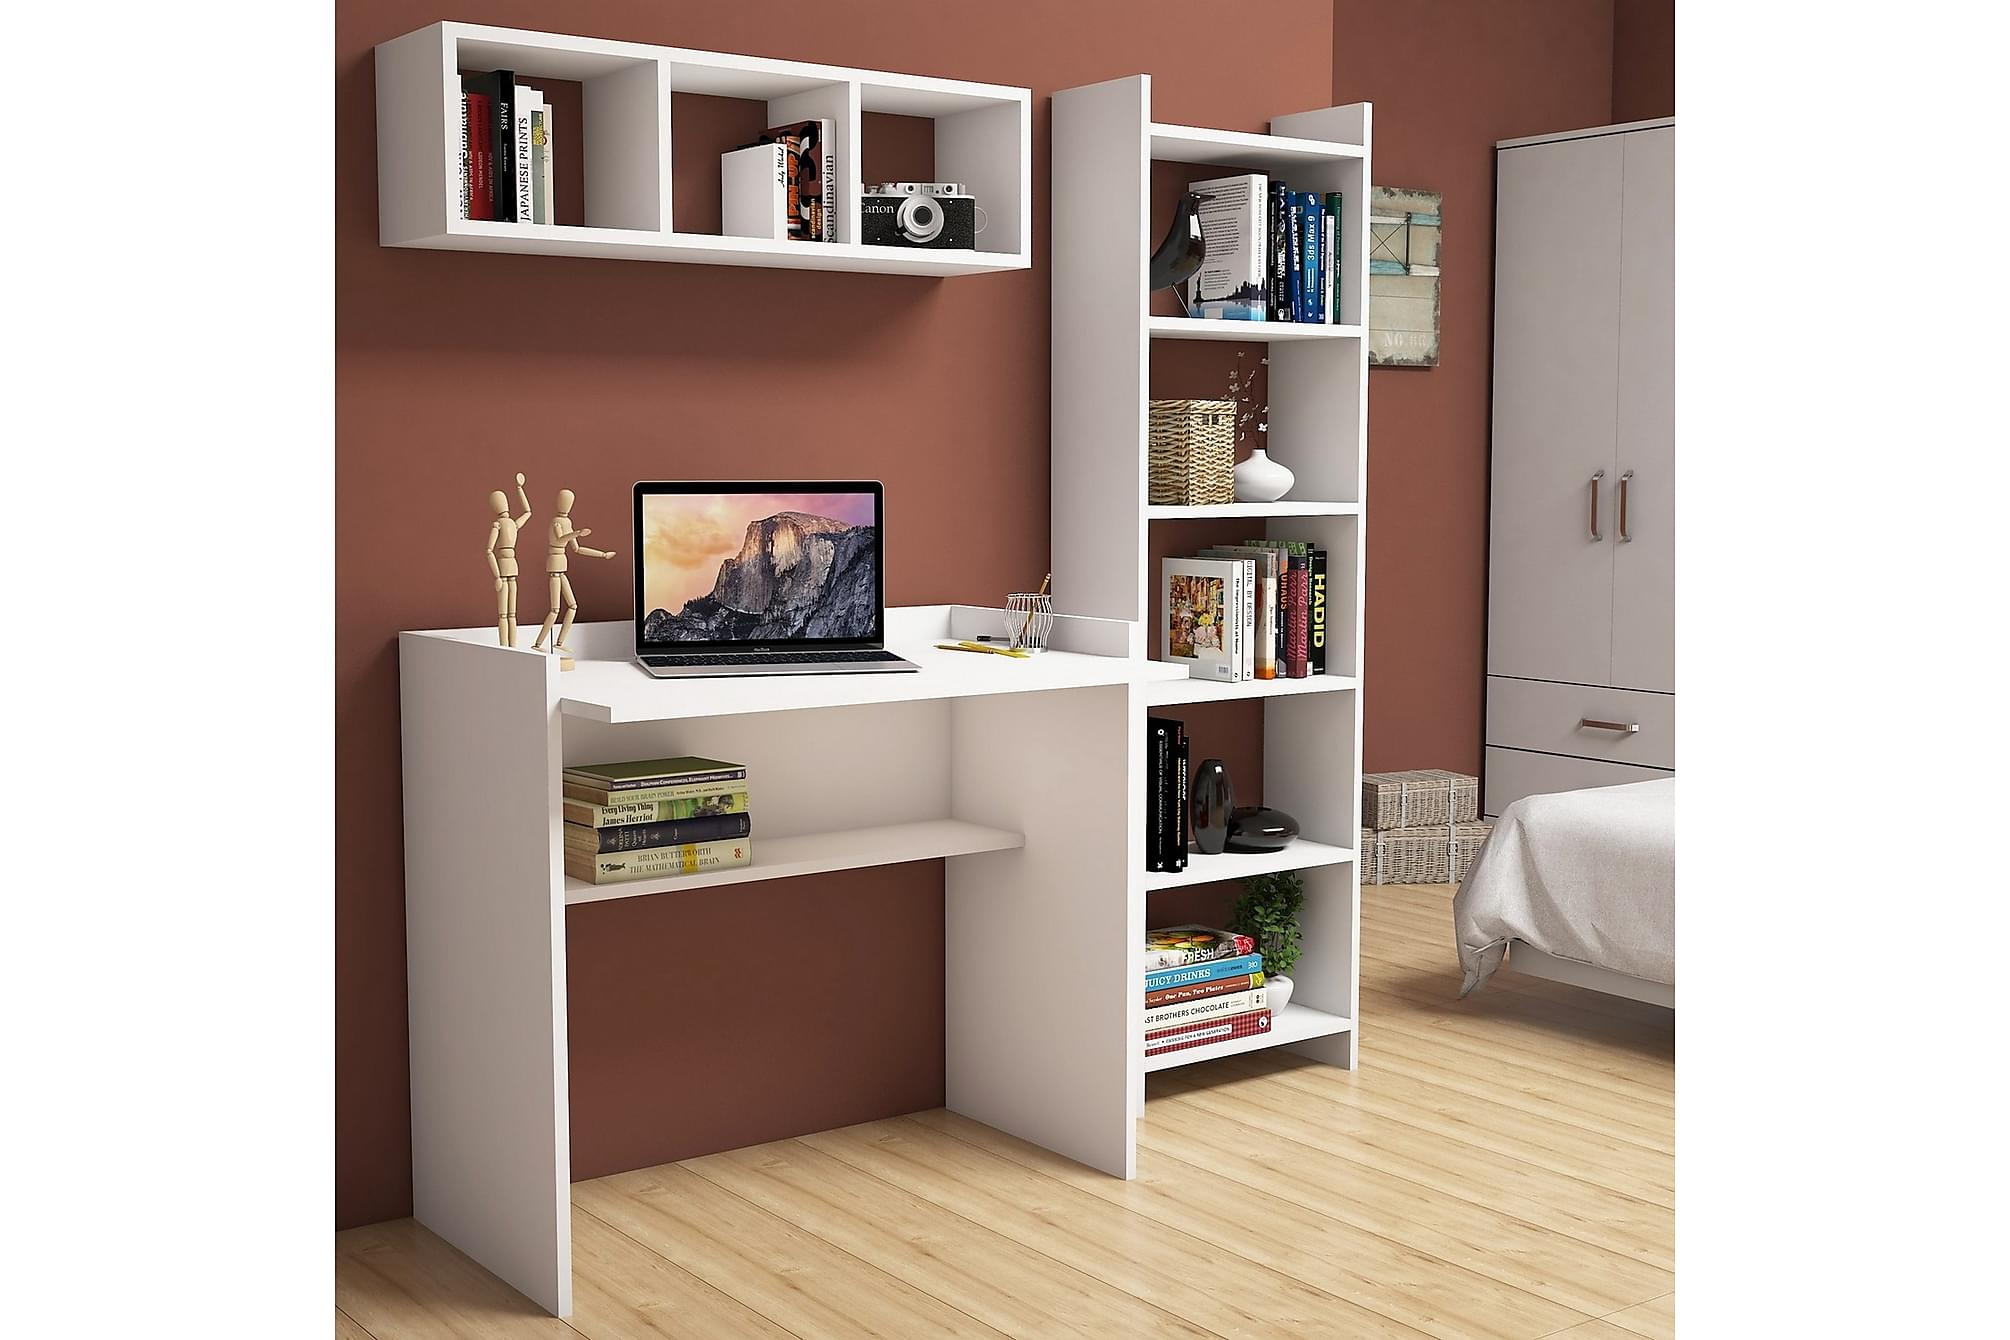 JAZALLE Kontorsmöbelset 90 cm Vit, Möbelset för kontor